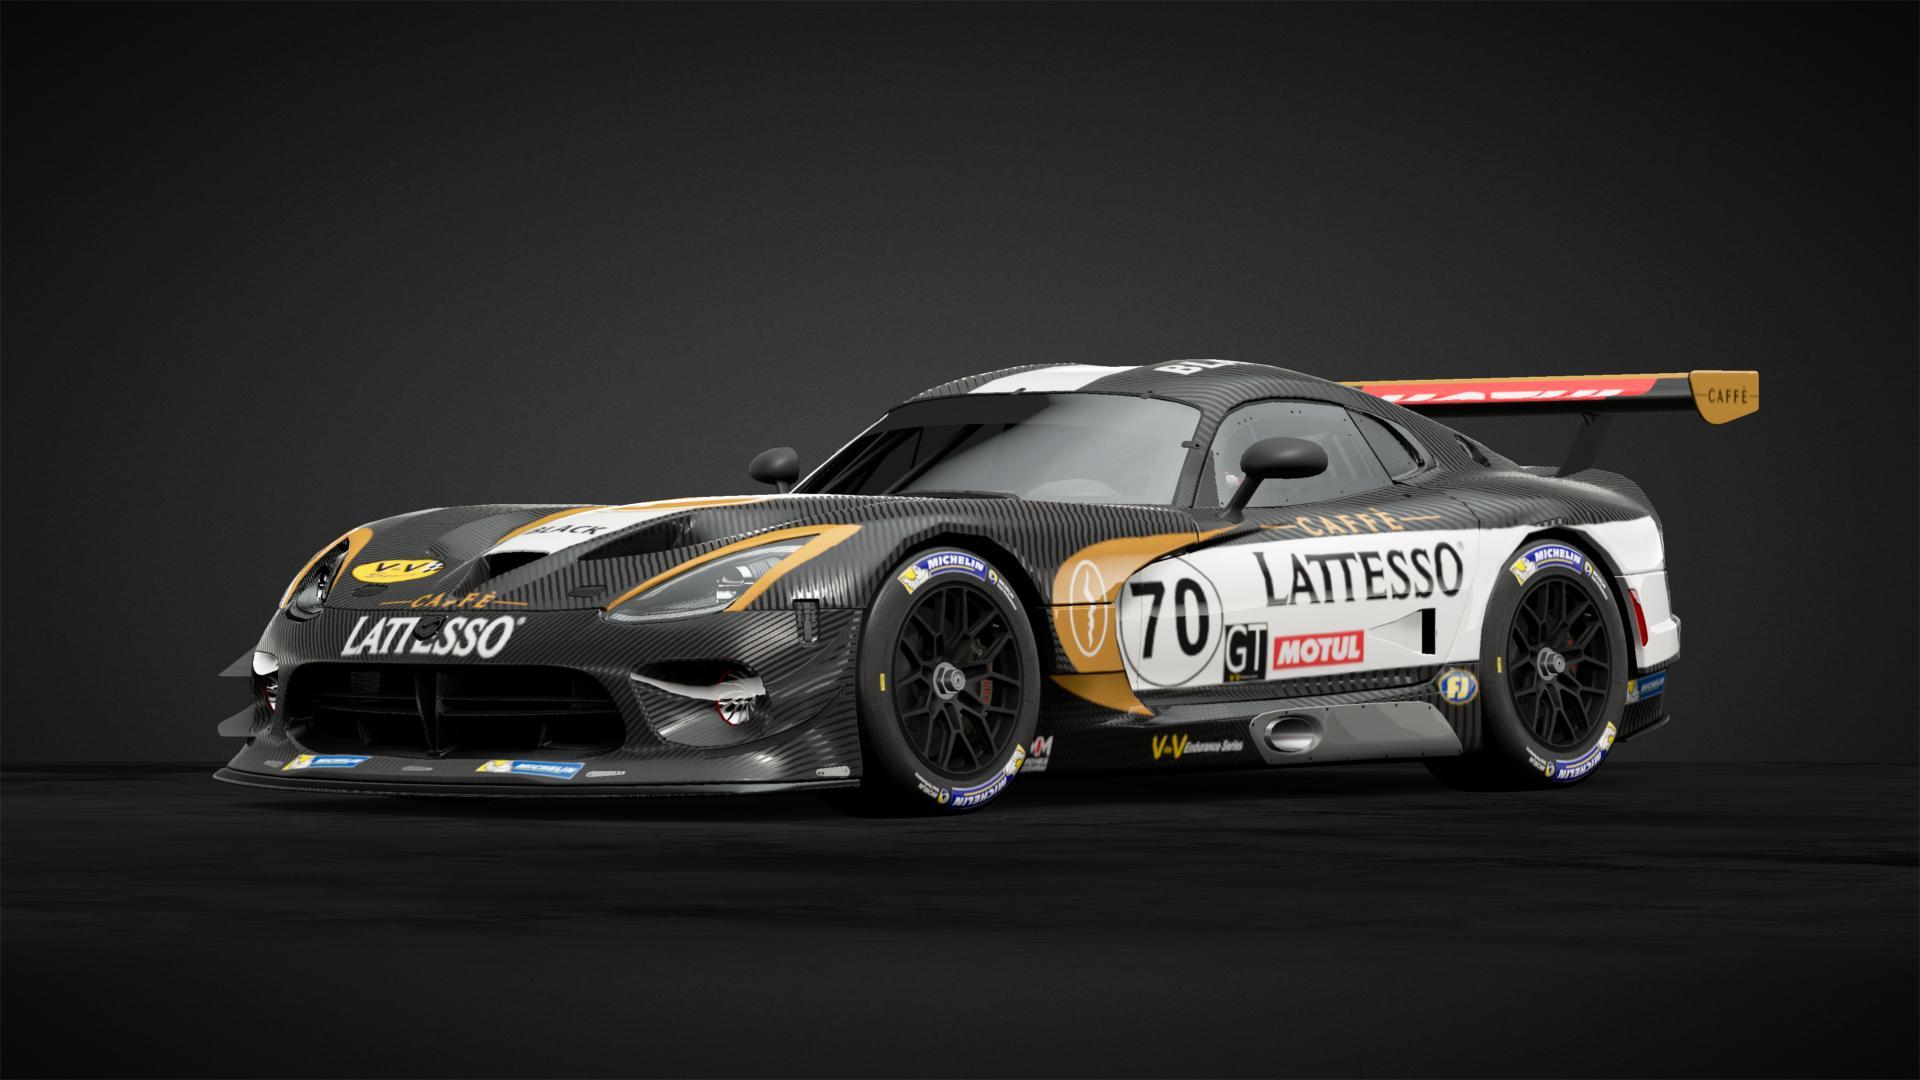 Caffe Lattesso Car Livery By Mex Racing Community Gran